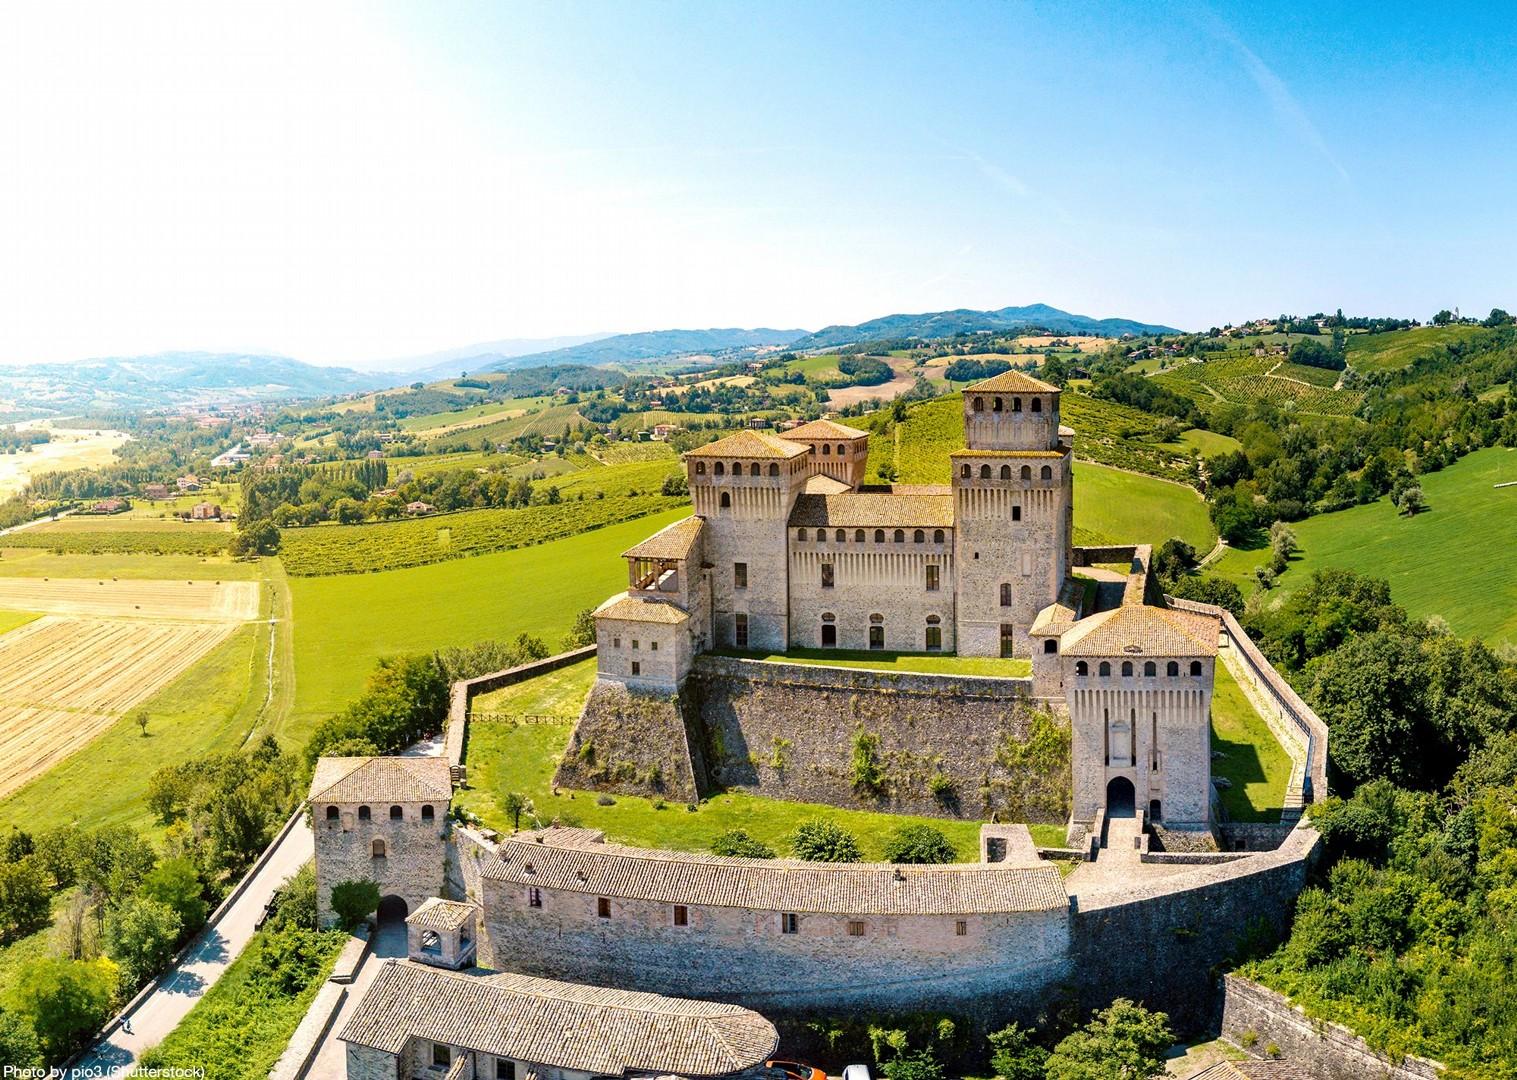 torrechiara-castle-italy-parma-self-guided-leisure-cycling-holiday.jpg - Italy - Emilia Romagna - Self-Guided Leisure Cycling Holiday - Leisure Cycling